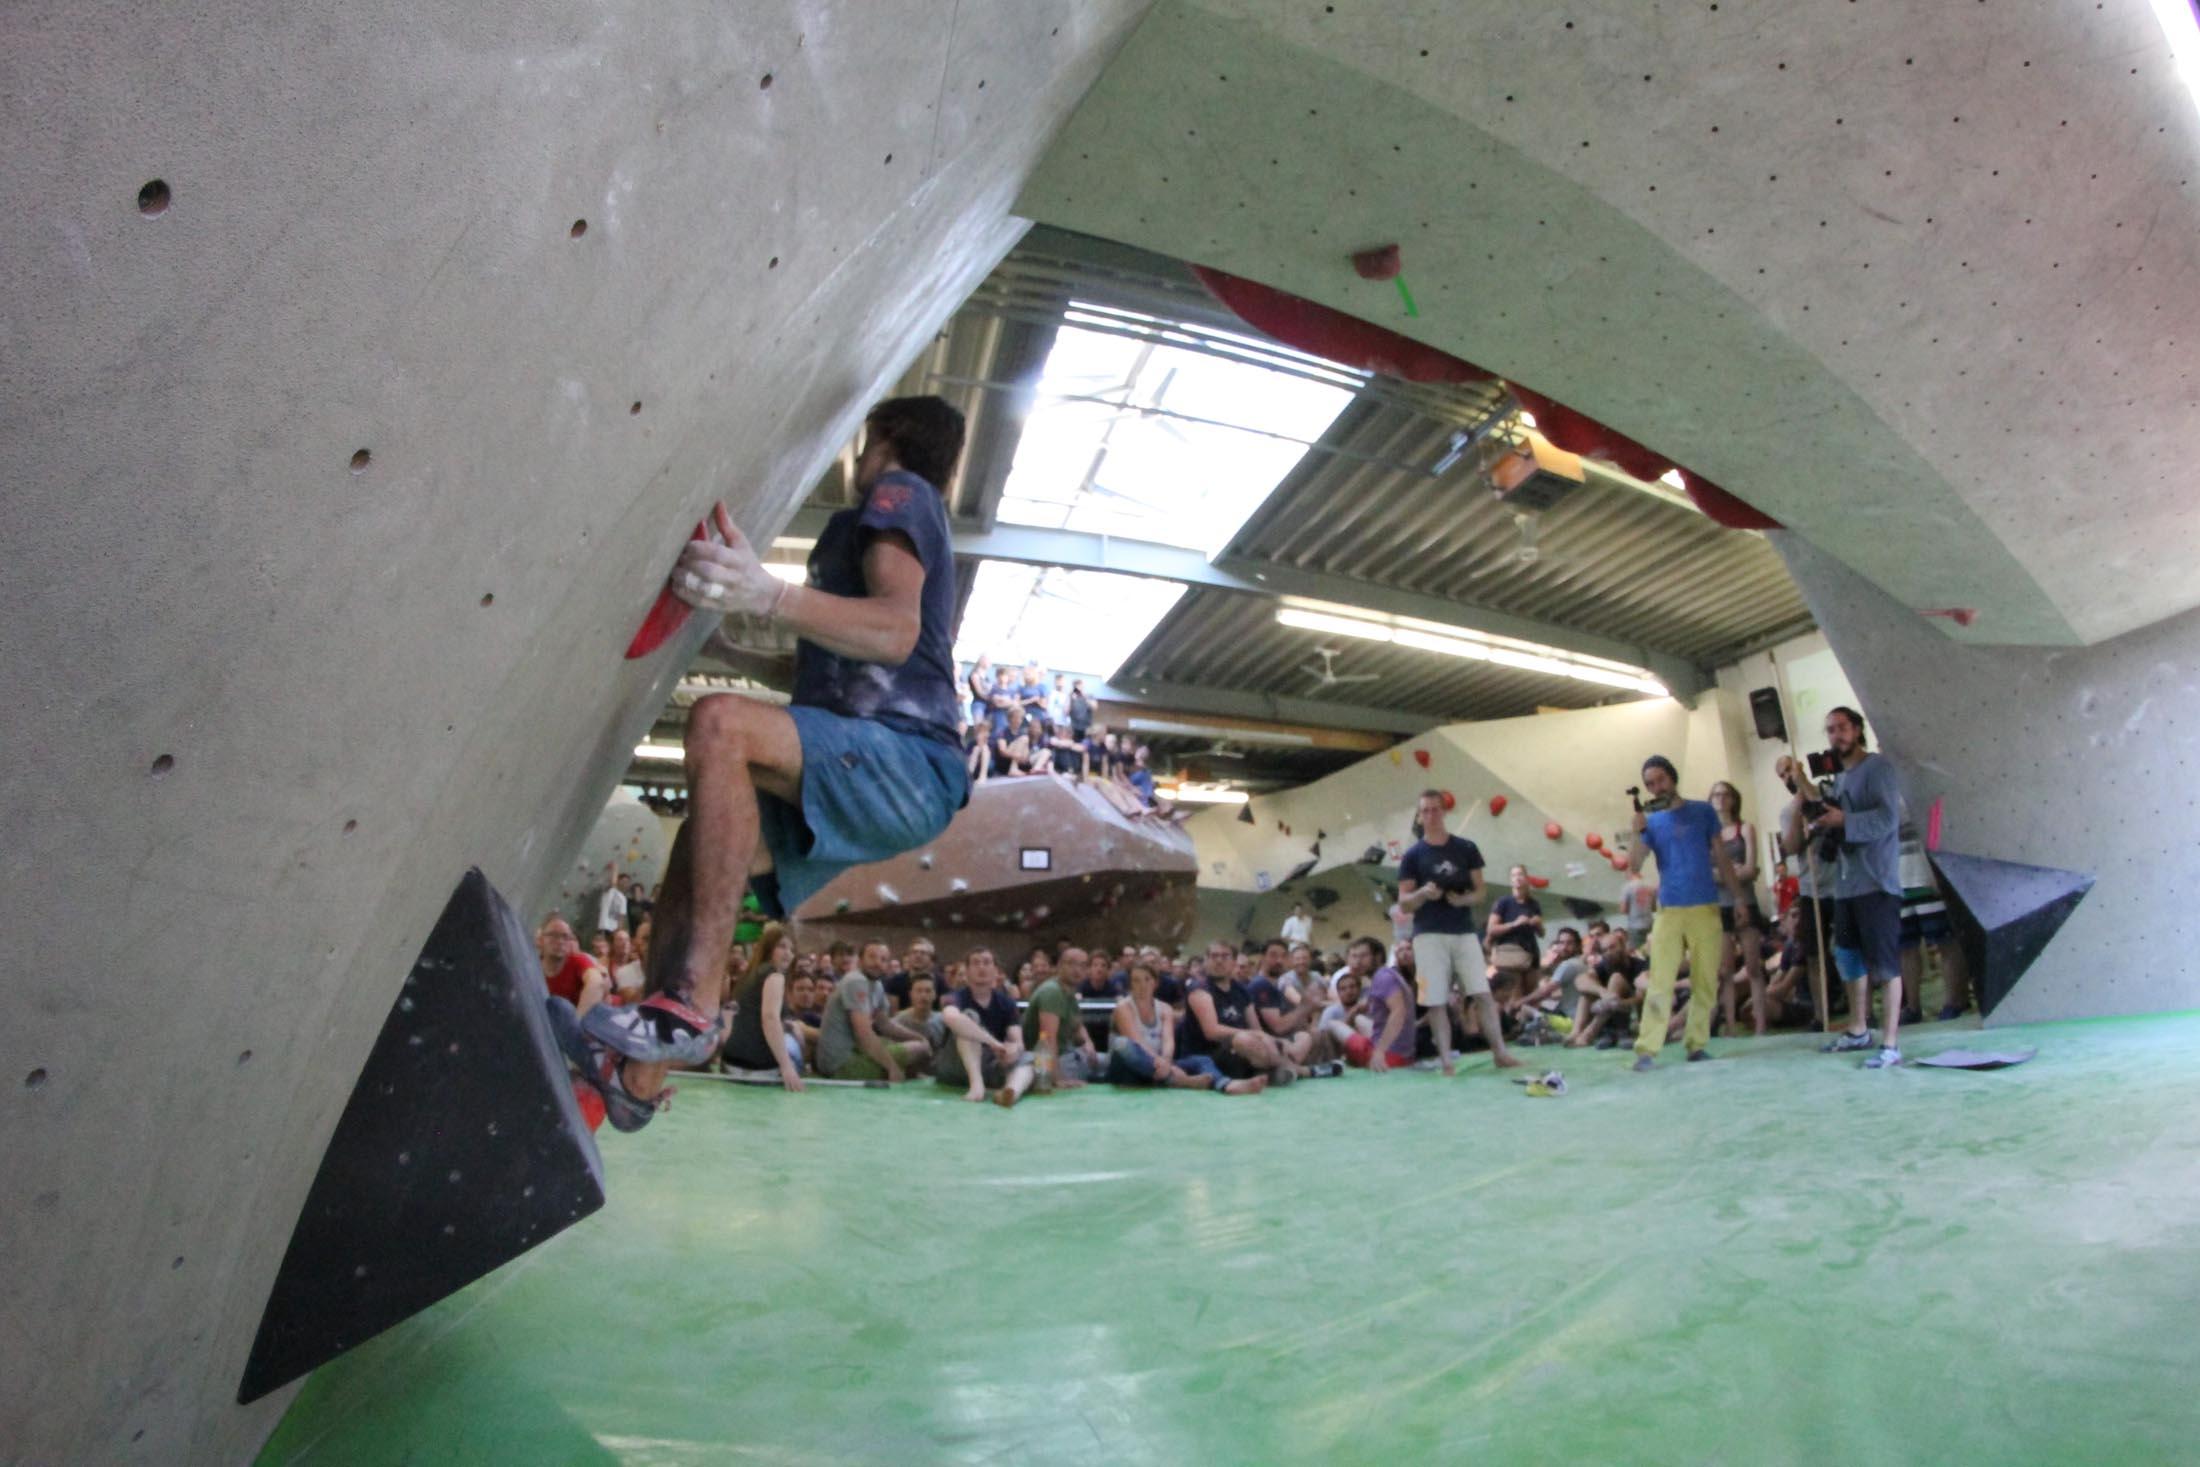 Finale, internationaler bouldercup Frankenjura 2016, BLOCKHELDEN Erlangen, Mammut, Bergfreunde.de, Boulderwettkampf07092016618